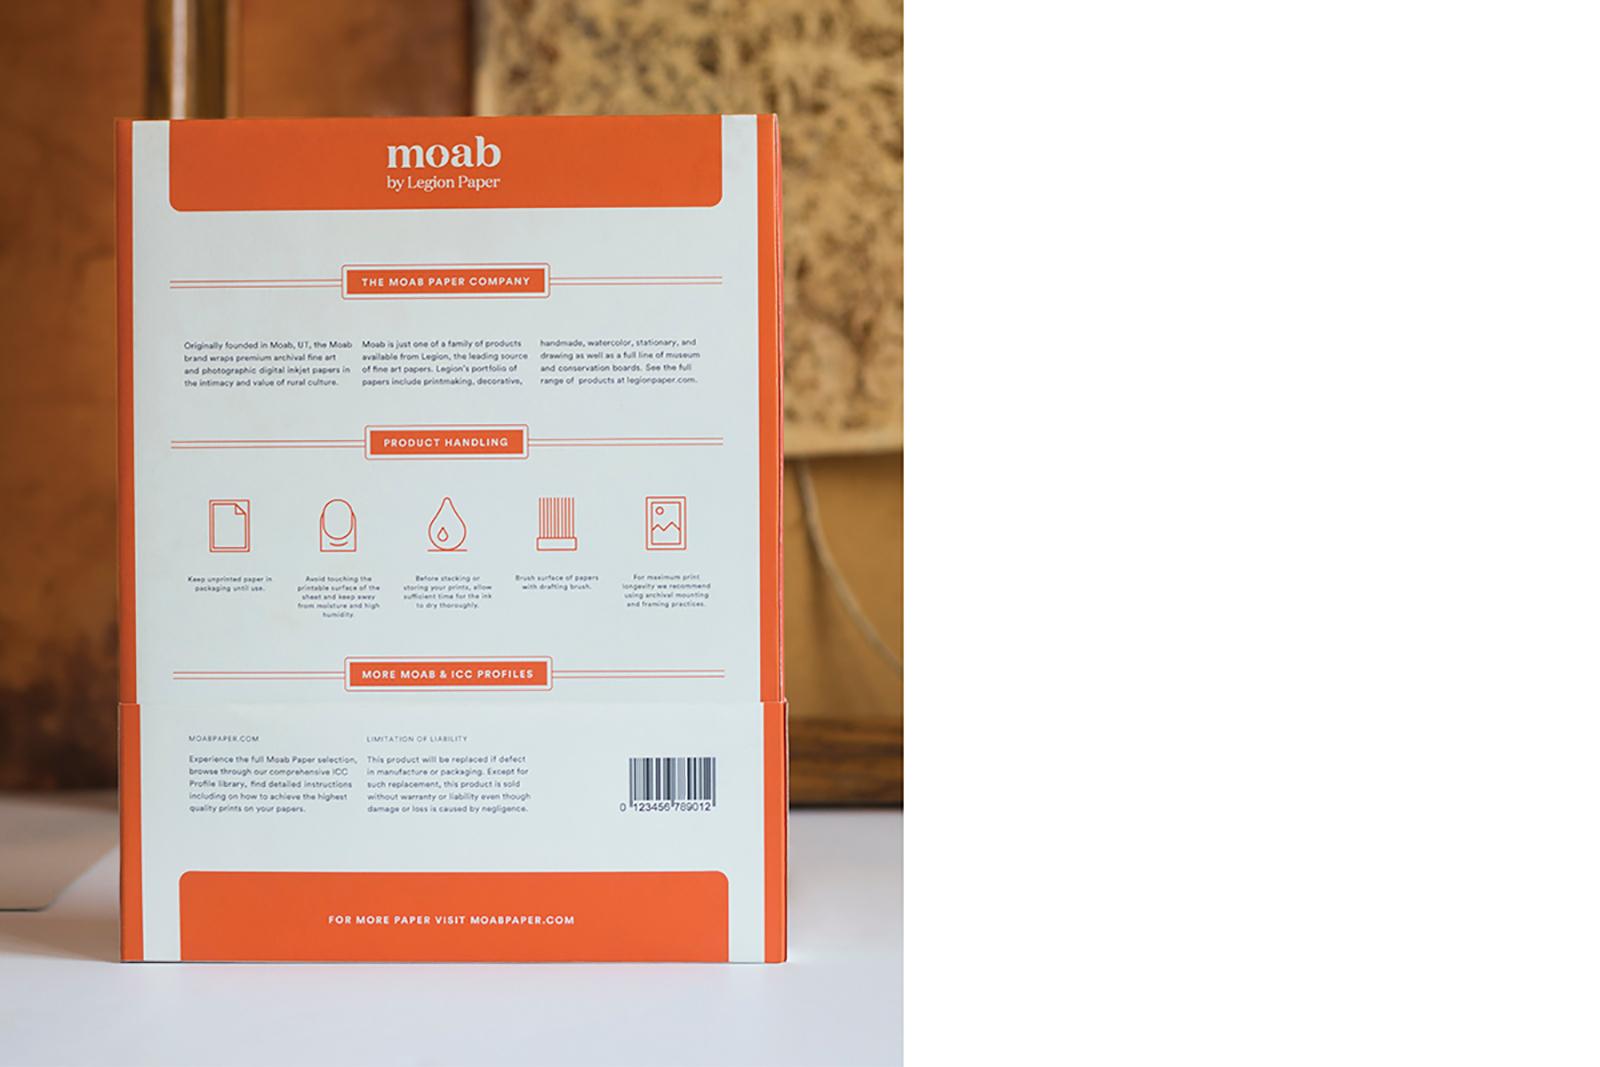 Moab纸张公司更新了全新的品牌形象-深圳VI设计6